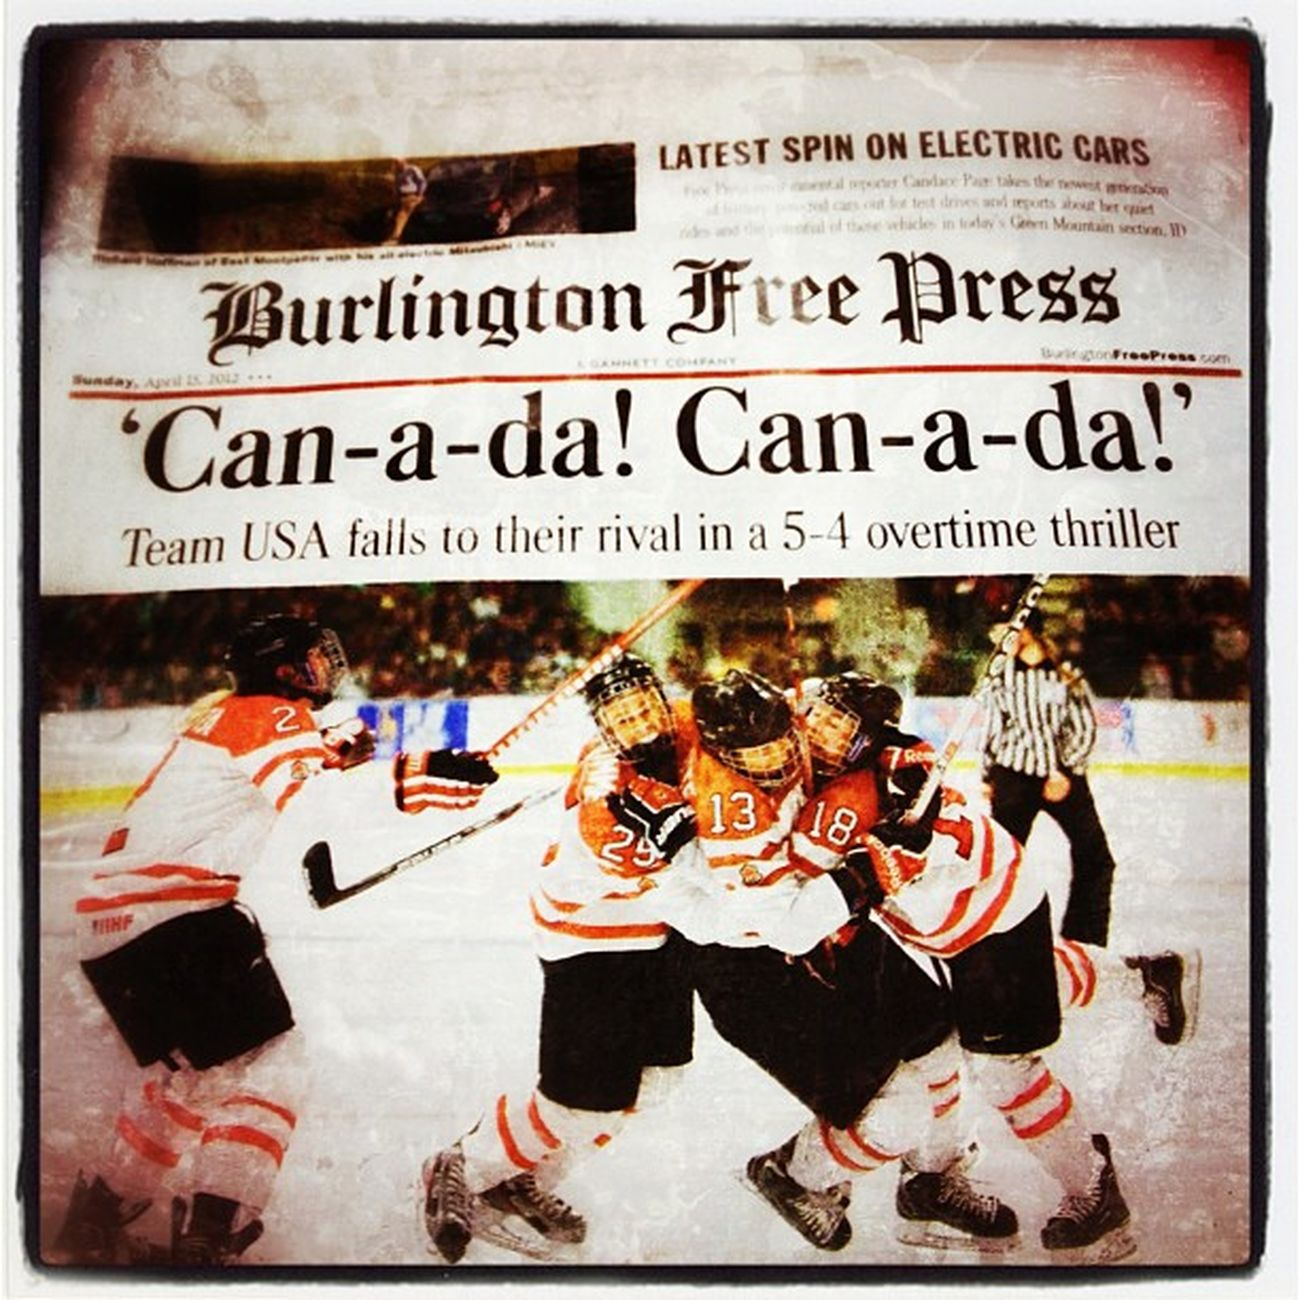 Great job girls! Congratulations #Canada! 802 Freepress Hockey Bfp_news Champions Gannett News Burlingtonfreepress University Bfp Canada Womens_hockey Win Patrick_gym Vermont Trophy Newspaper Worldcup Championship Vt Btv Uvm